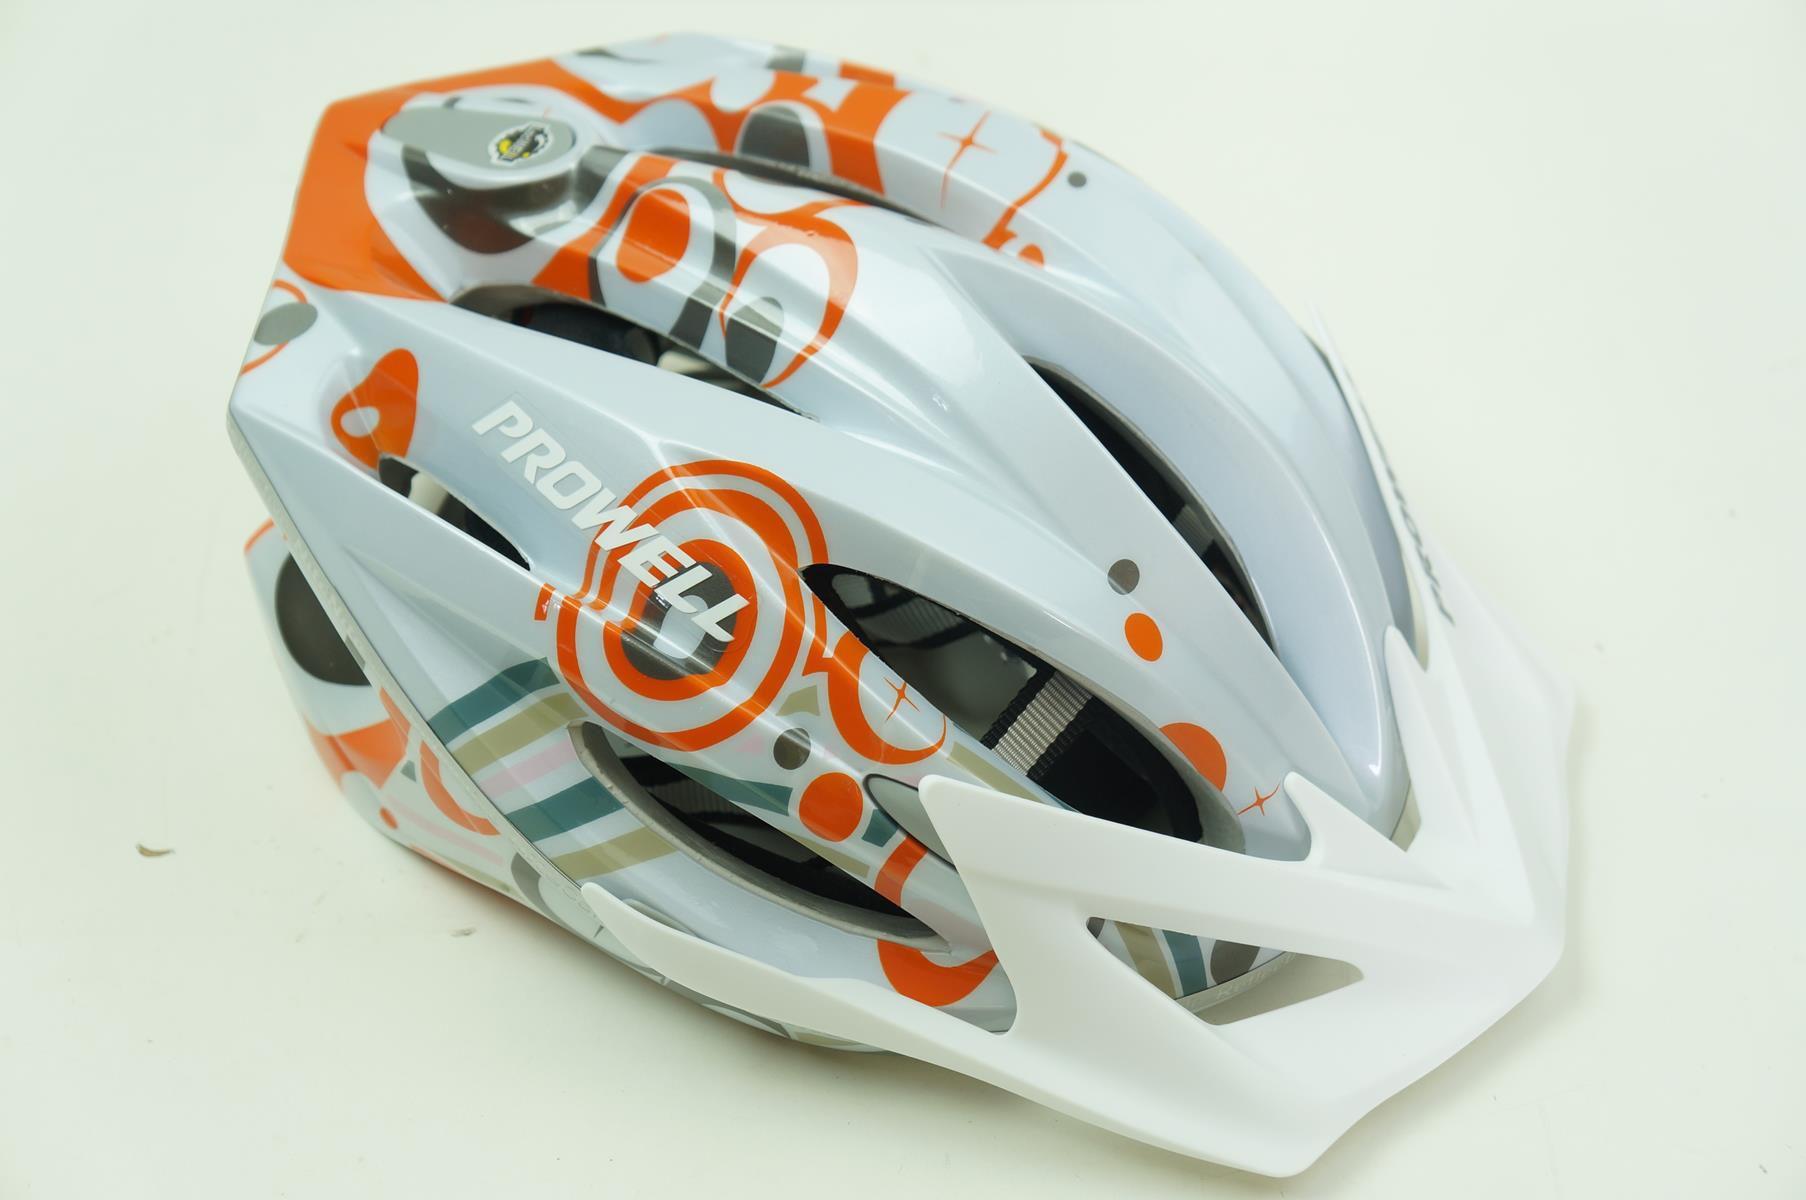 Capacete Bike Prowell F44 Tamanho M Com Viseira Cor Branco com Laranja